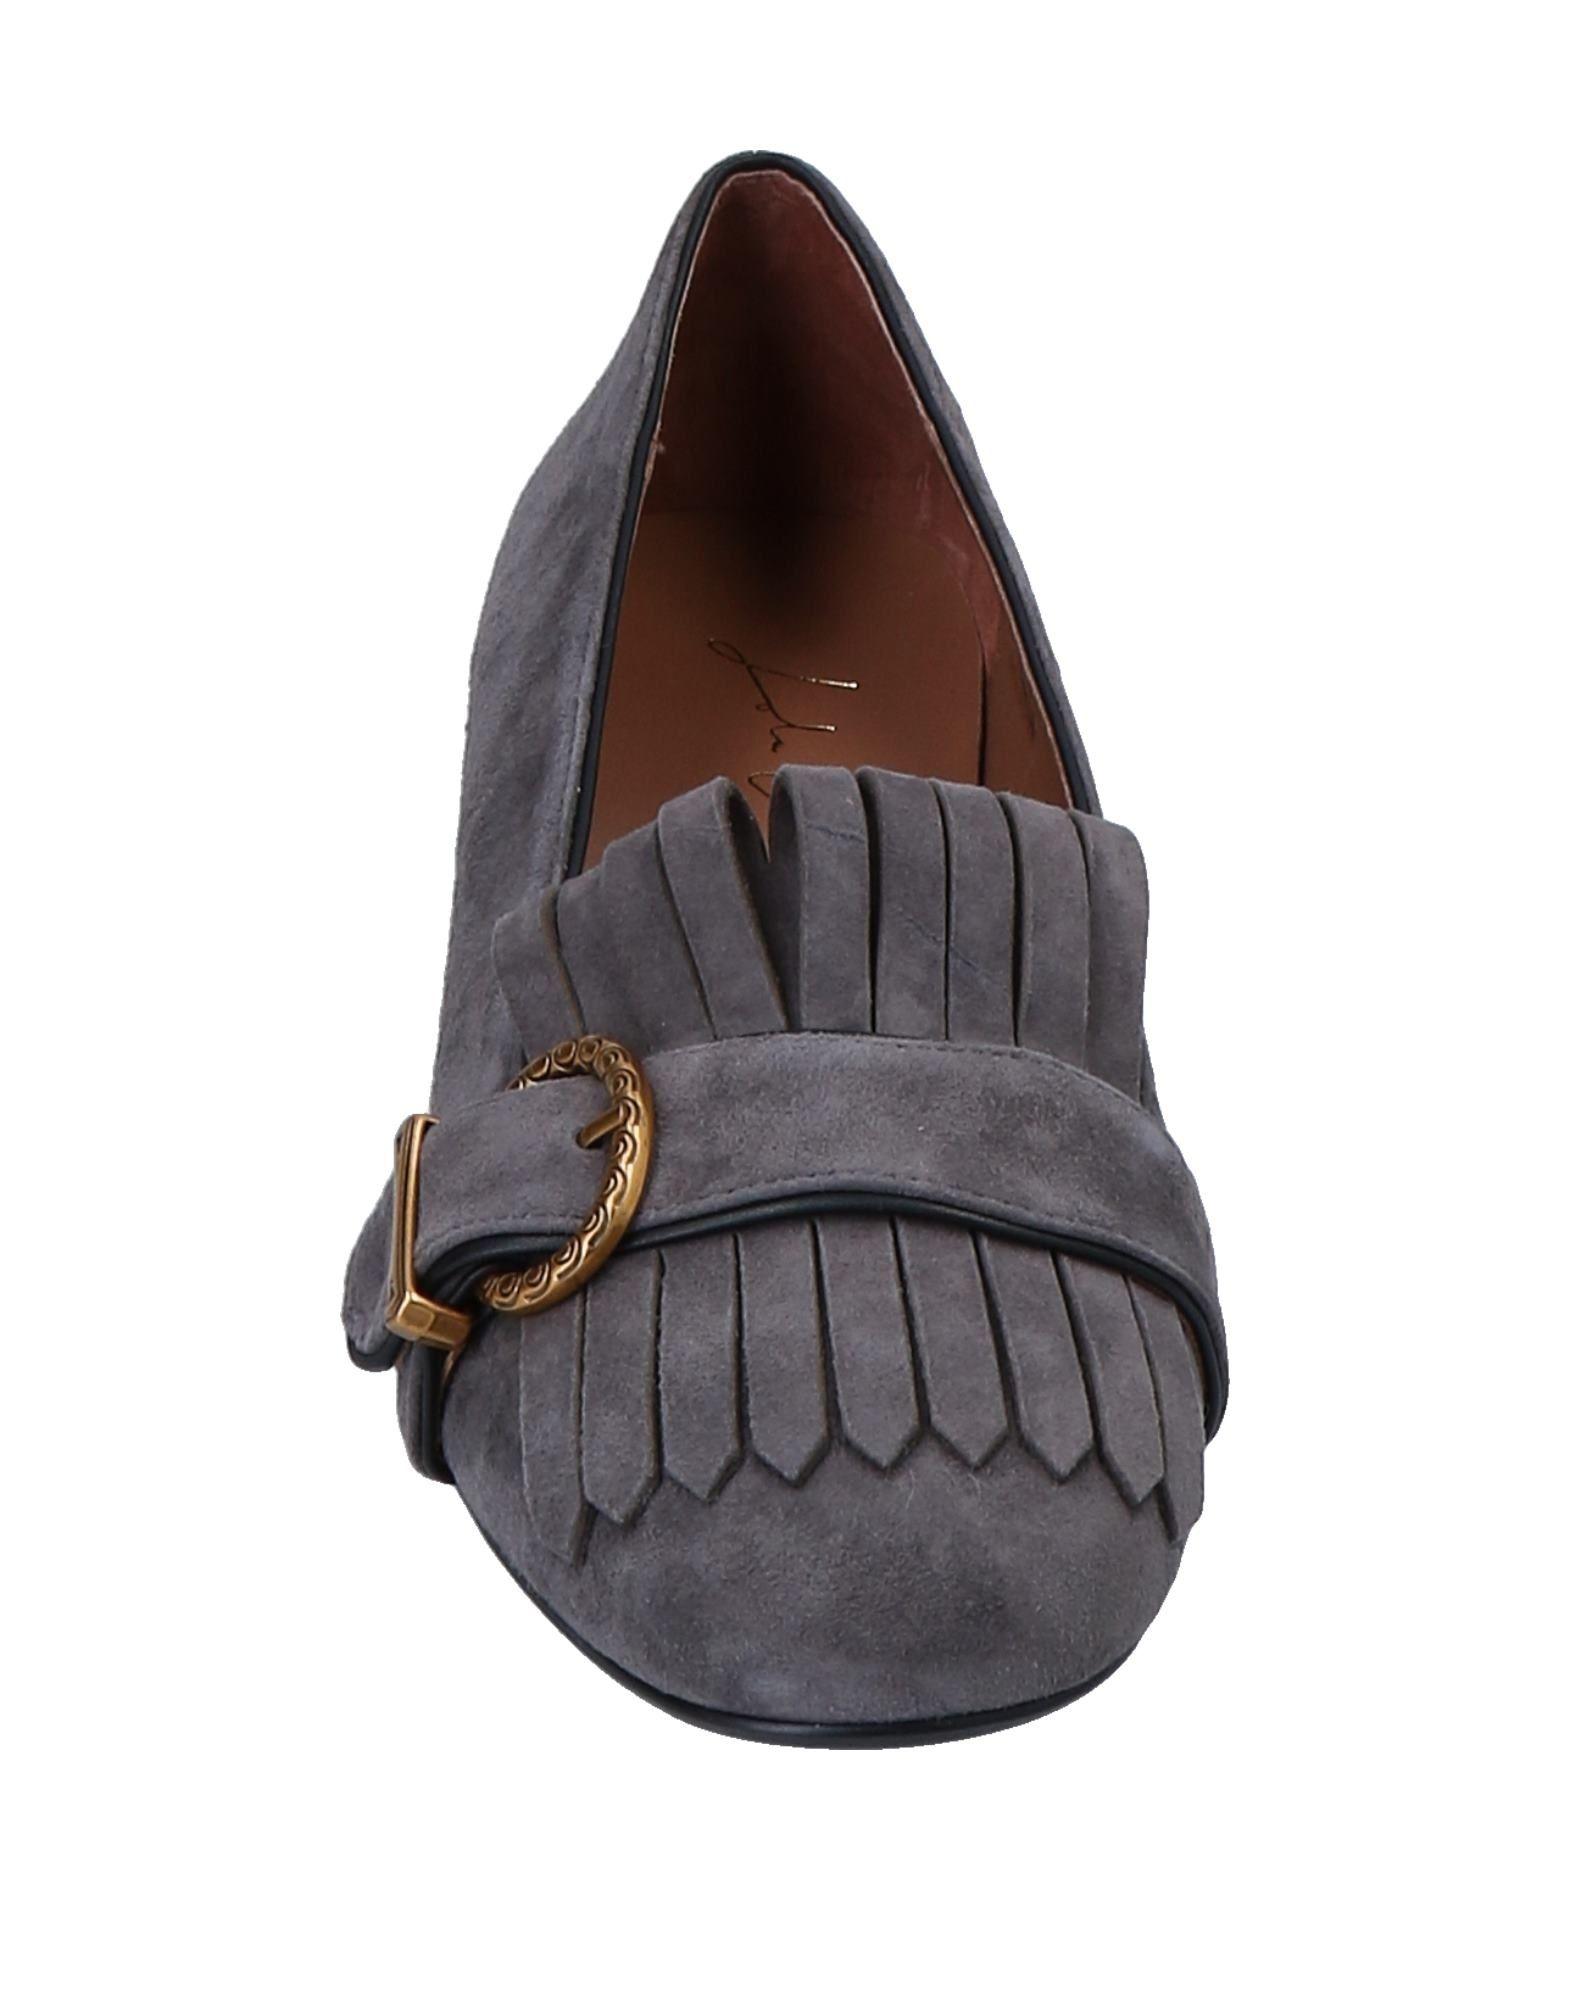 Stilvolle billige Schuhe Lola 11547748MO Cruz Mokassins Damen  11547748MO Lola 4b336a